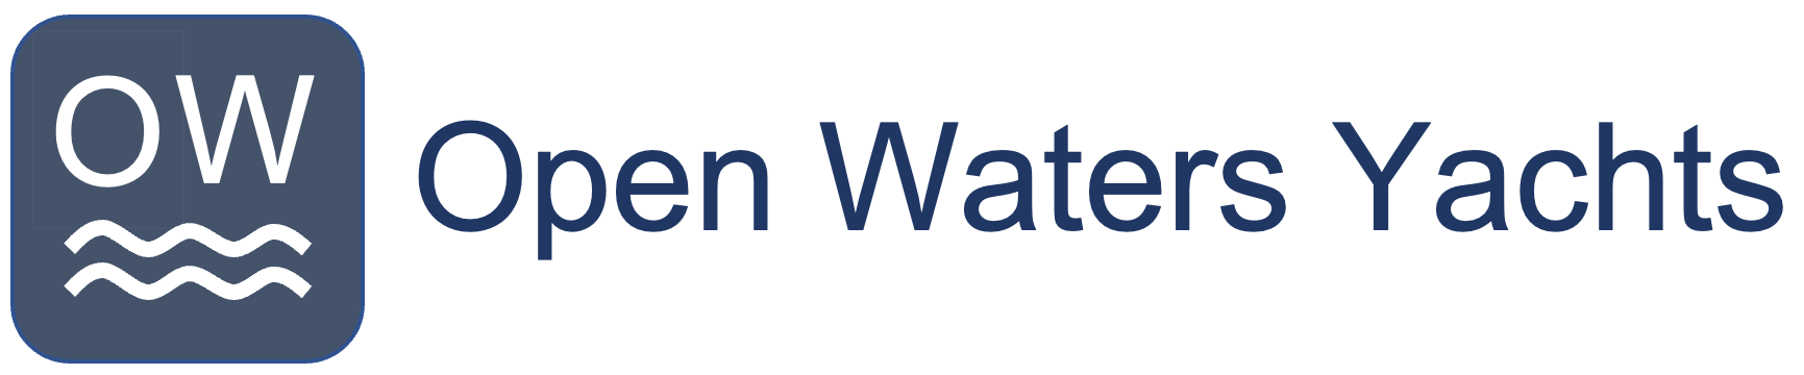 Open Waters Yachts Logo